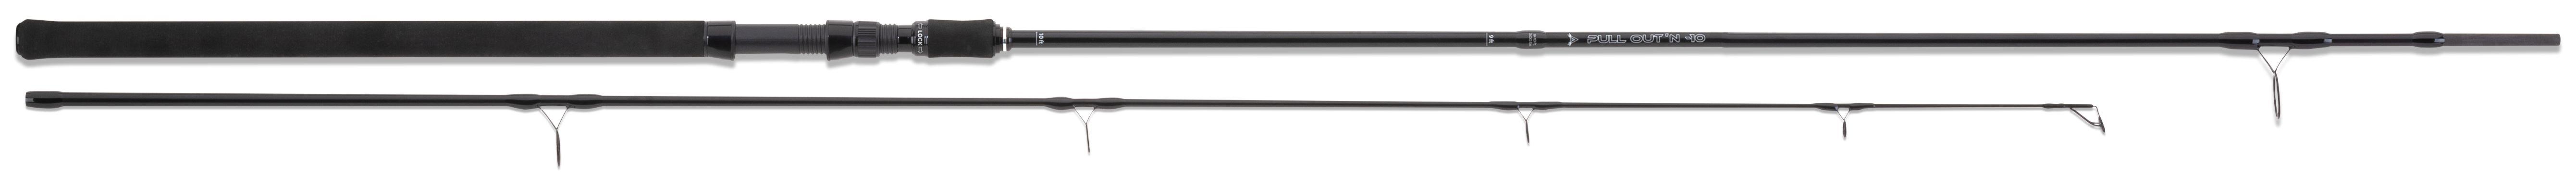 Anaconda prut Xtasy Pull Out'N- Series 9-10 ft/3,00 lb